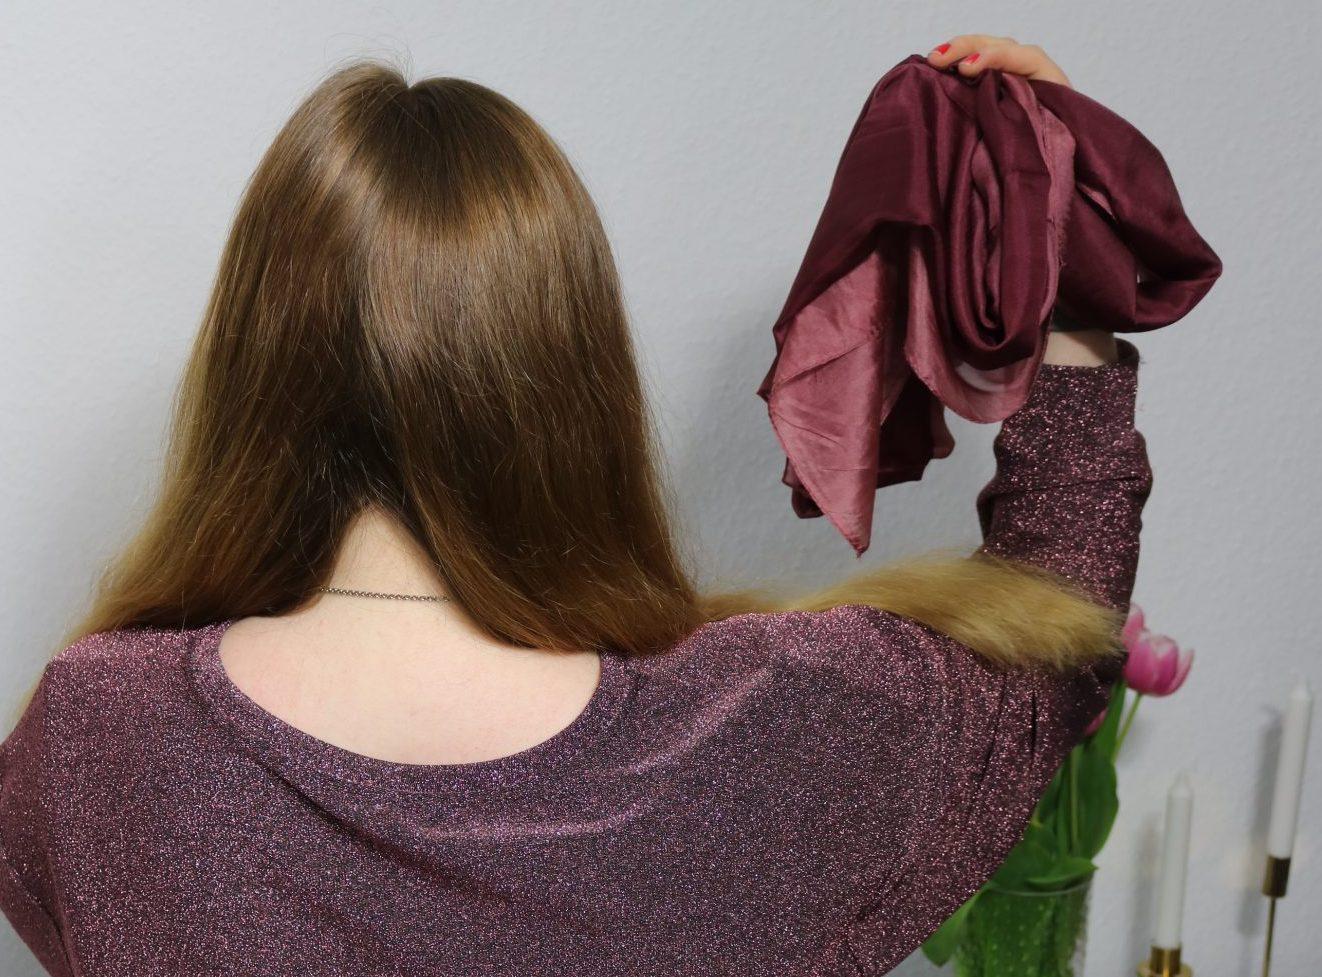 Haare selber flechten Anleitung einfache Frisur für Oktoberfest Haarkranz Flechtfrisur